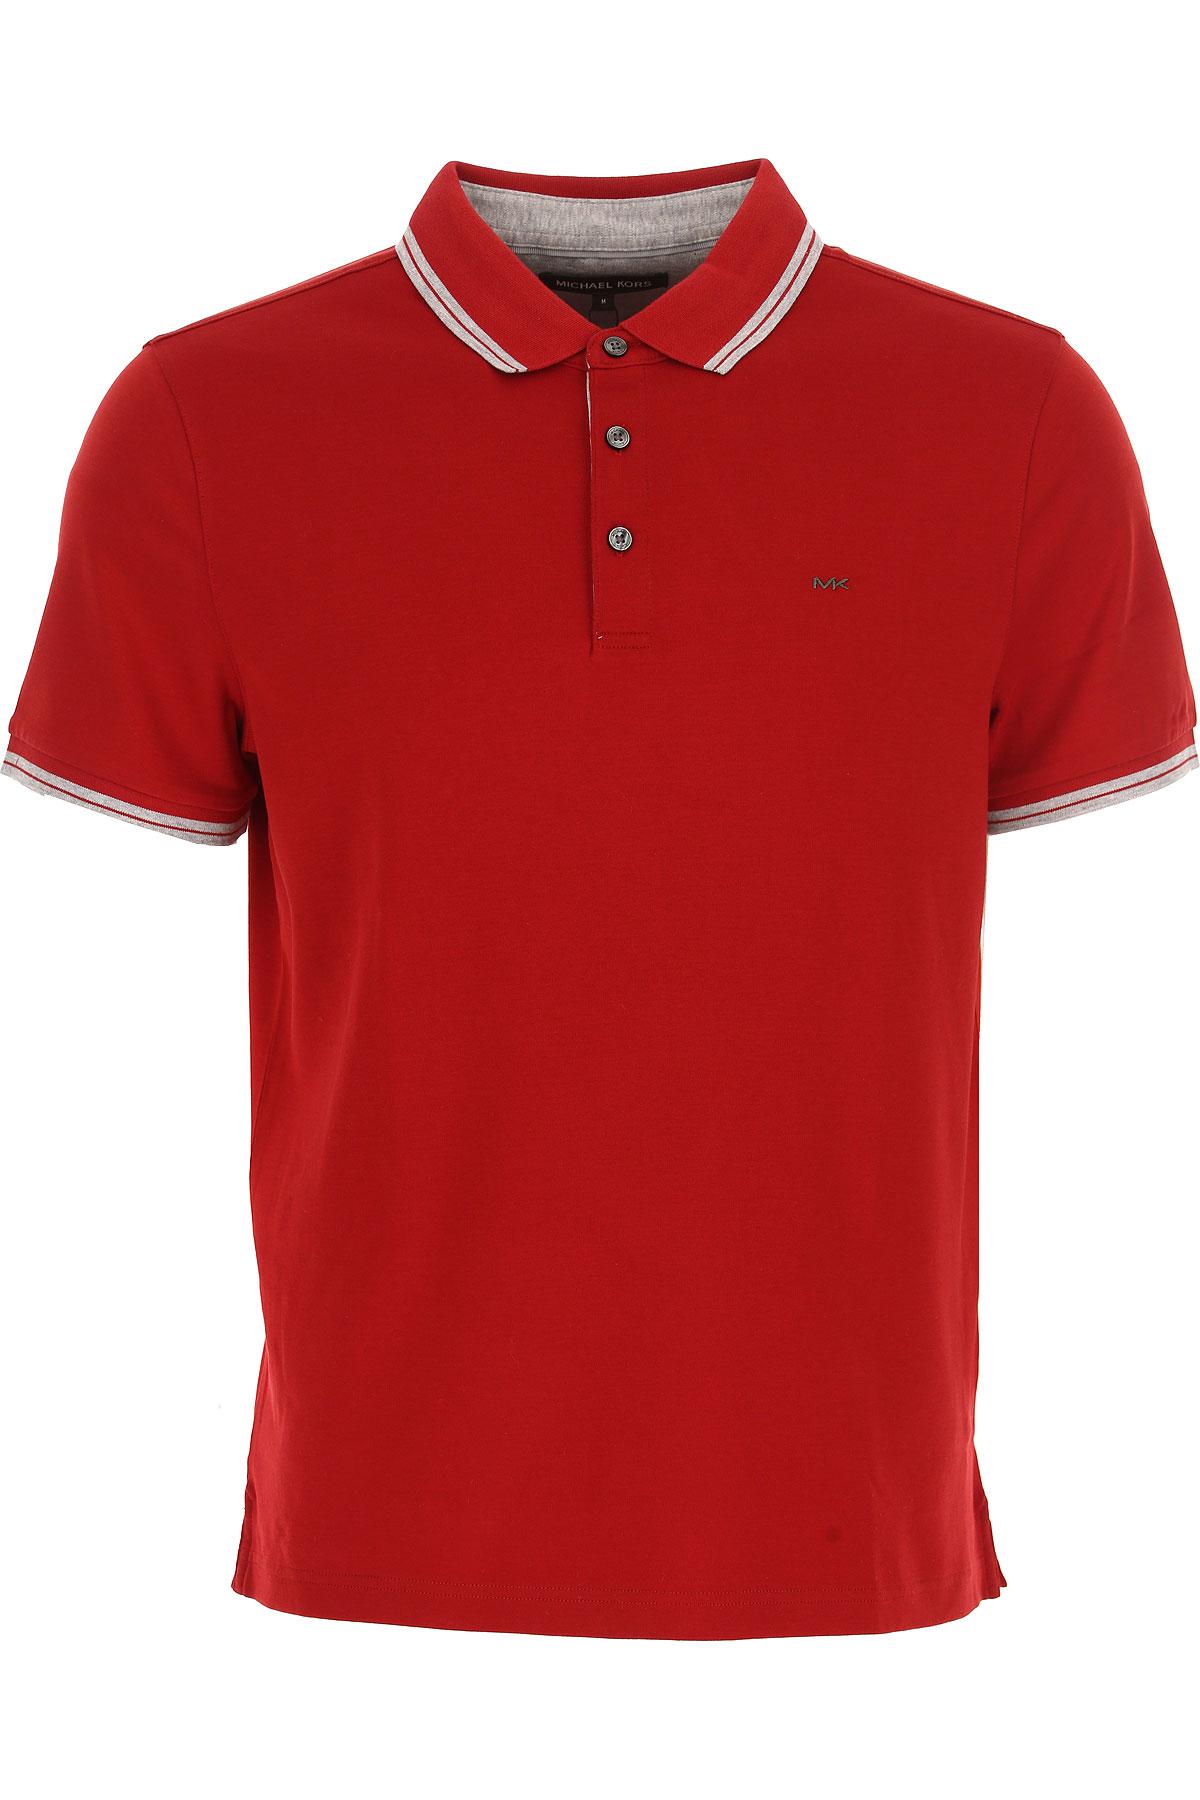 Michael Kors Polo Shirt for Men, Dark Red, Cotton, 2017, L M S XL XS USA-451279